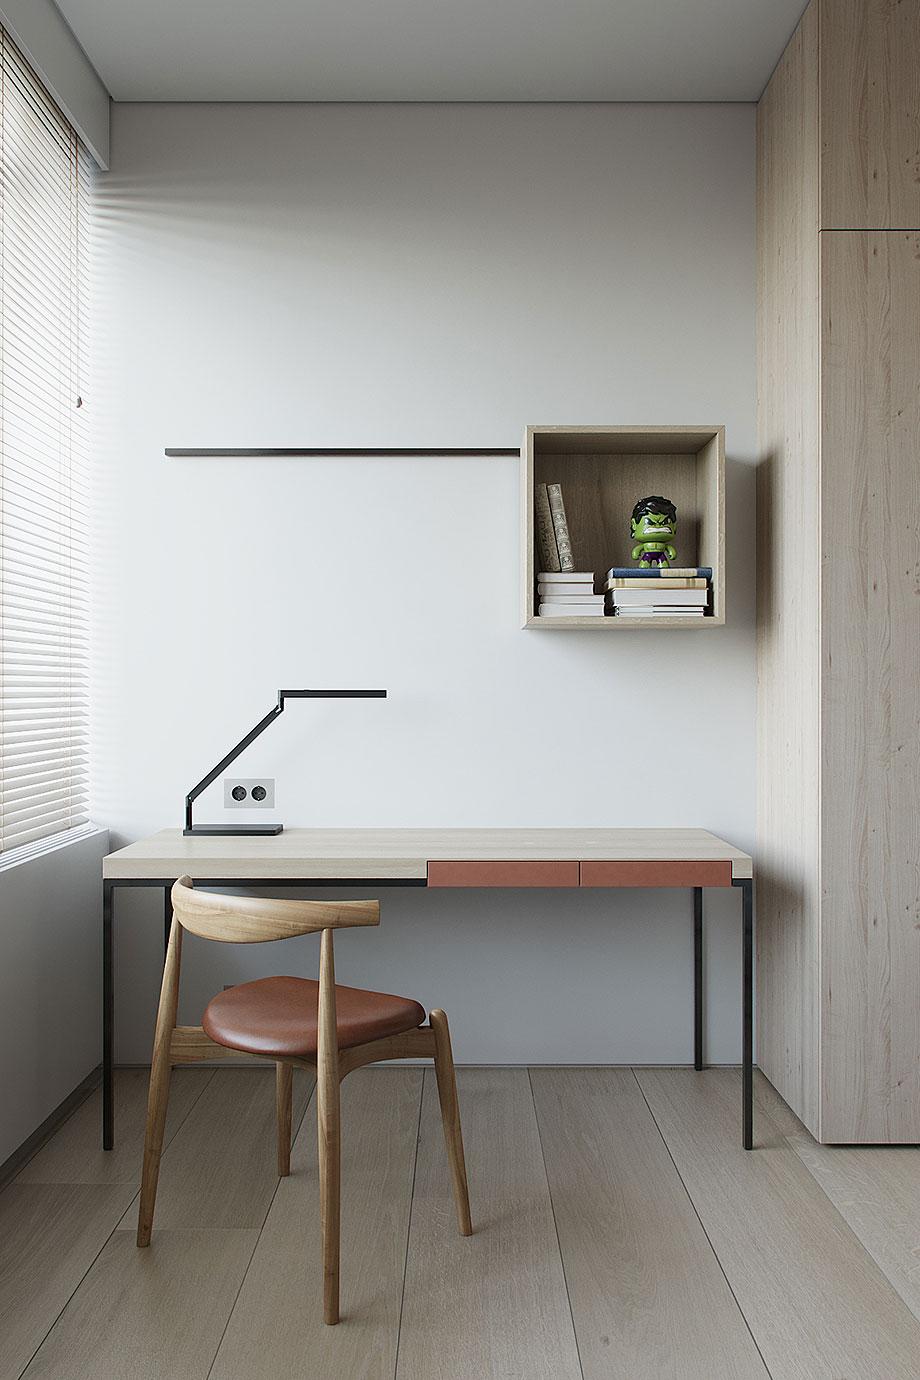 apartamento en moscu de kodd bureau (23) - foto daria koloskova